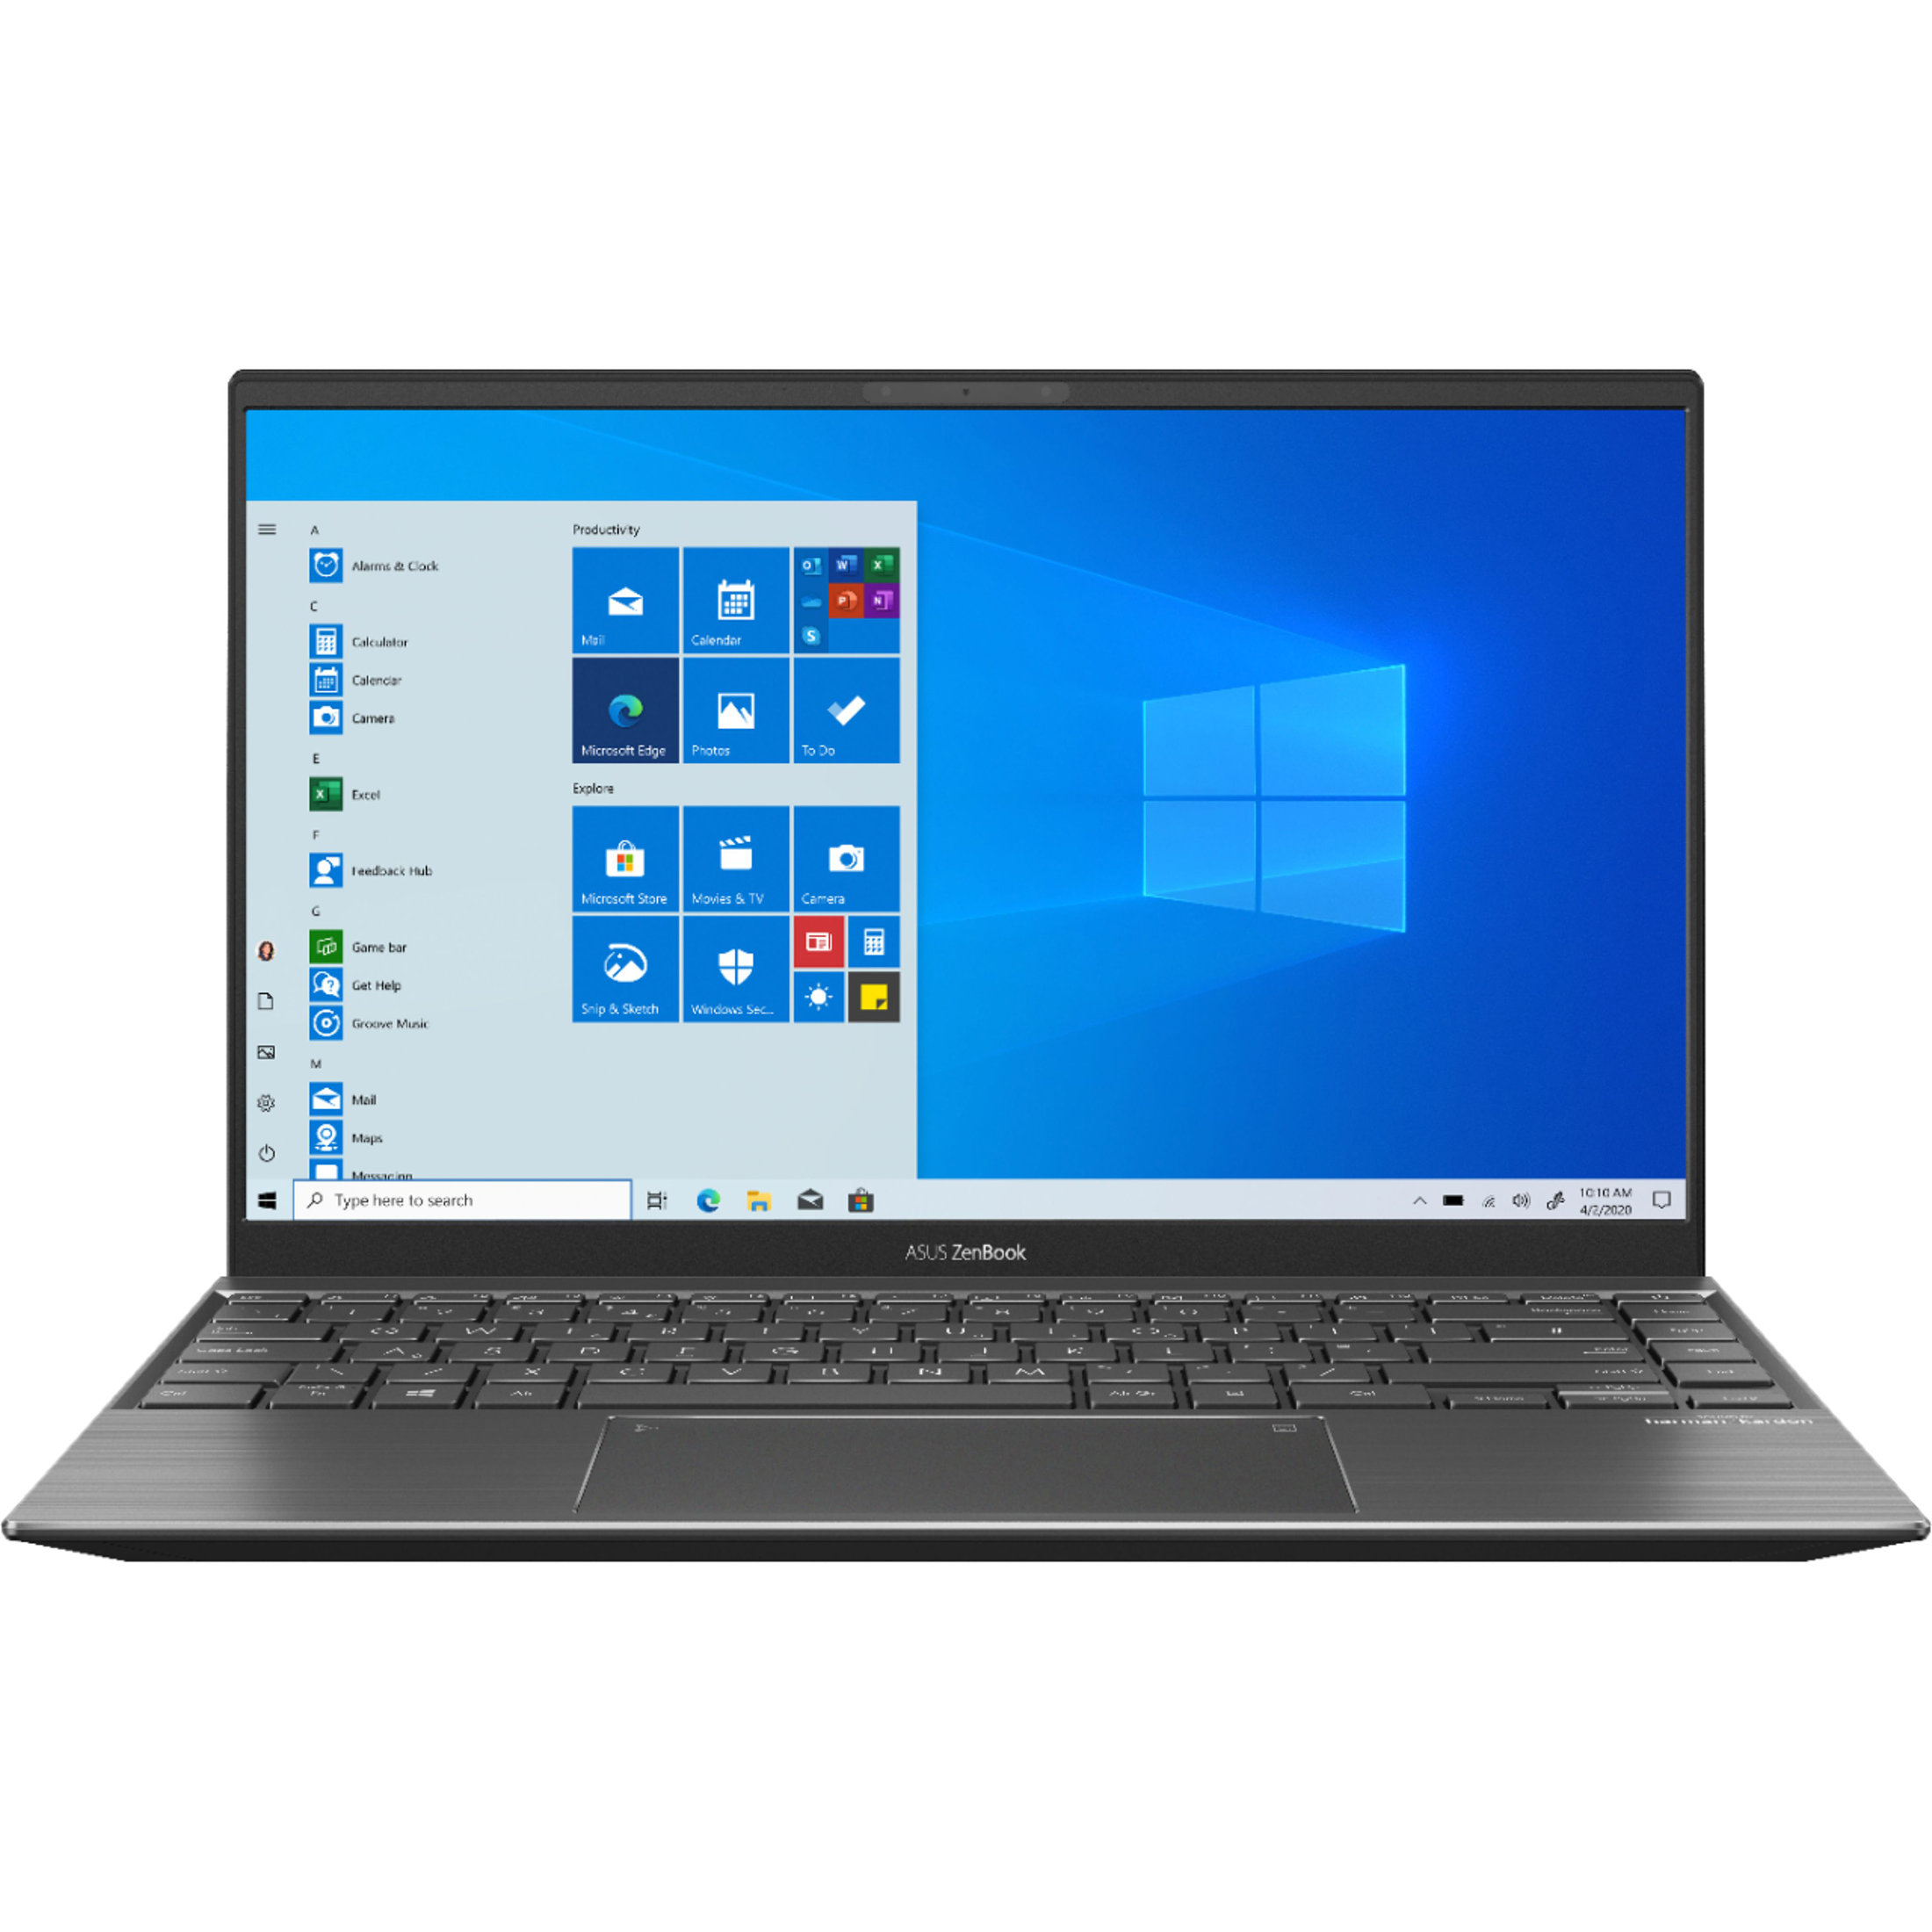 ASUS Zenbook Q Series (Q408UG-211.BL) 14″ Laptop, AMD Ryzen 5, 8GB RAM, 256GB SSD